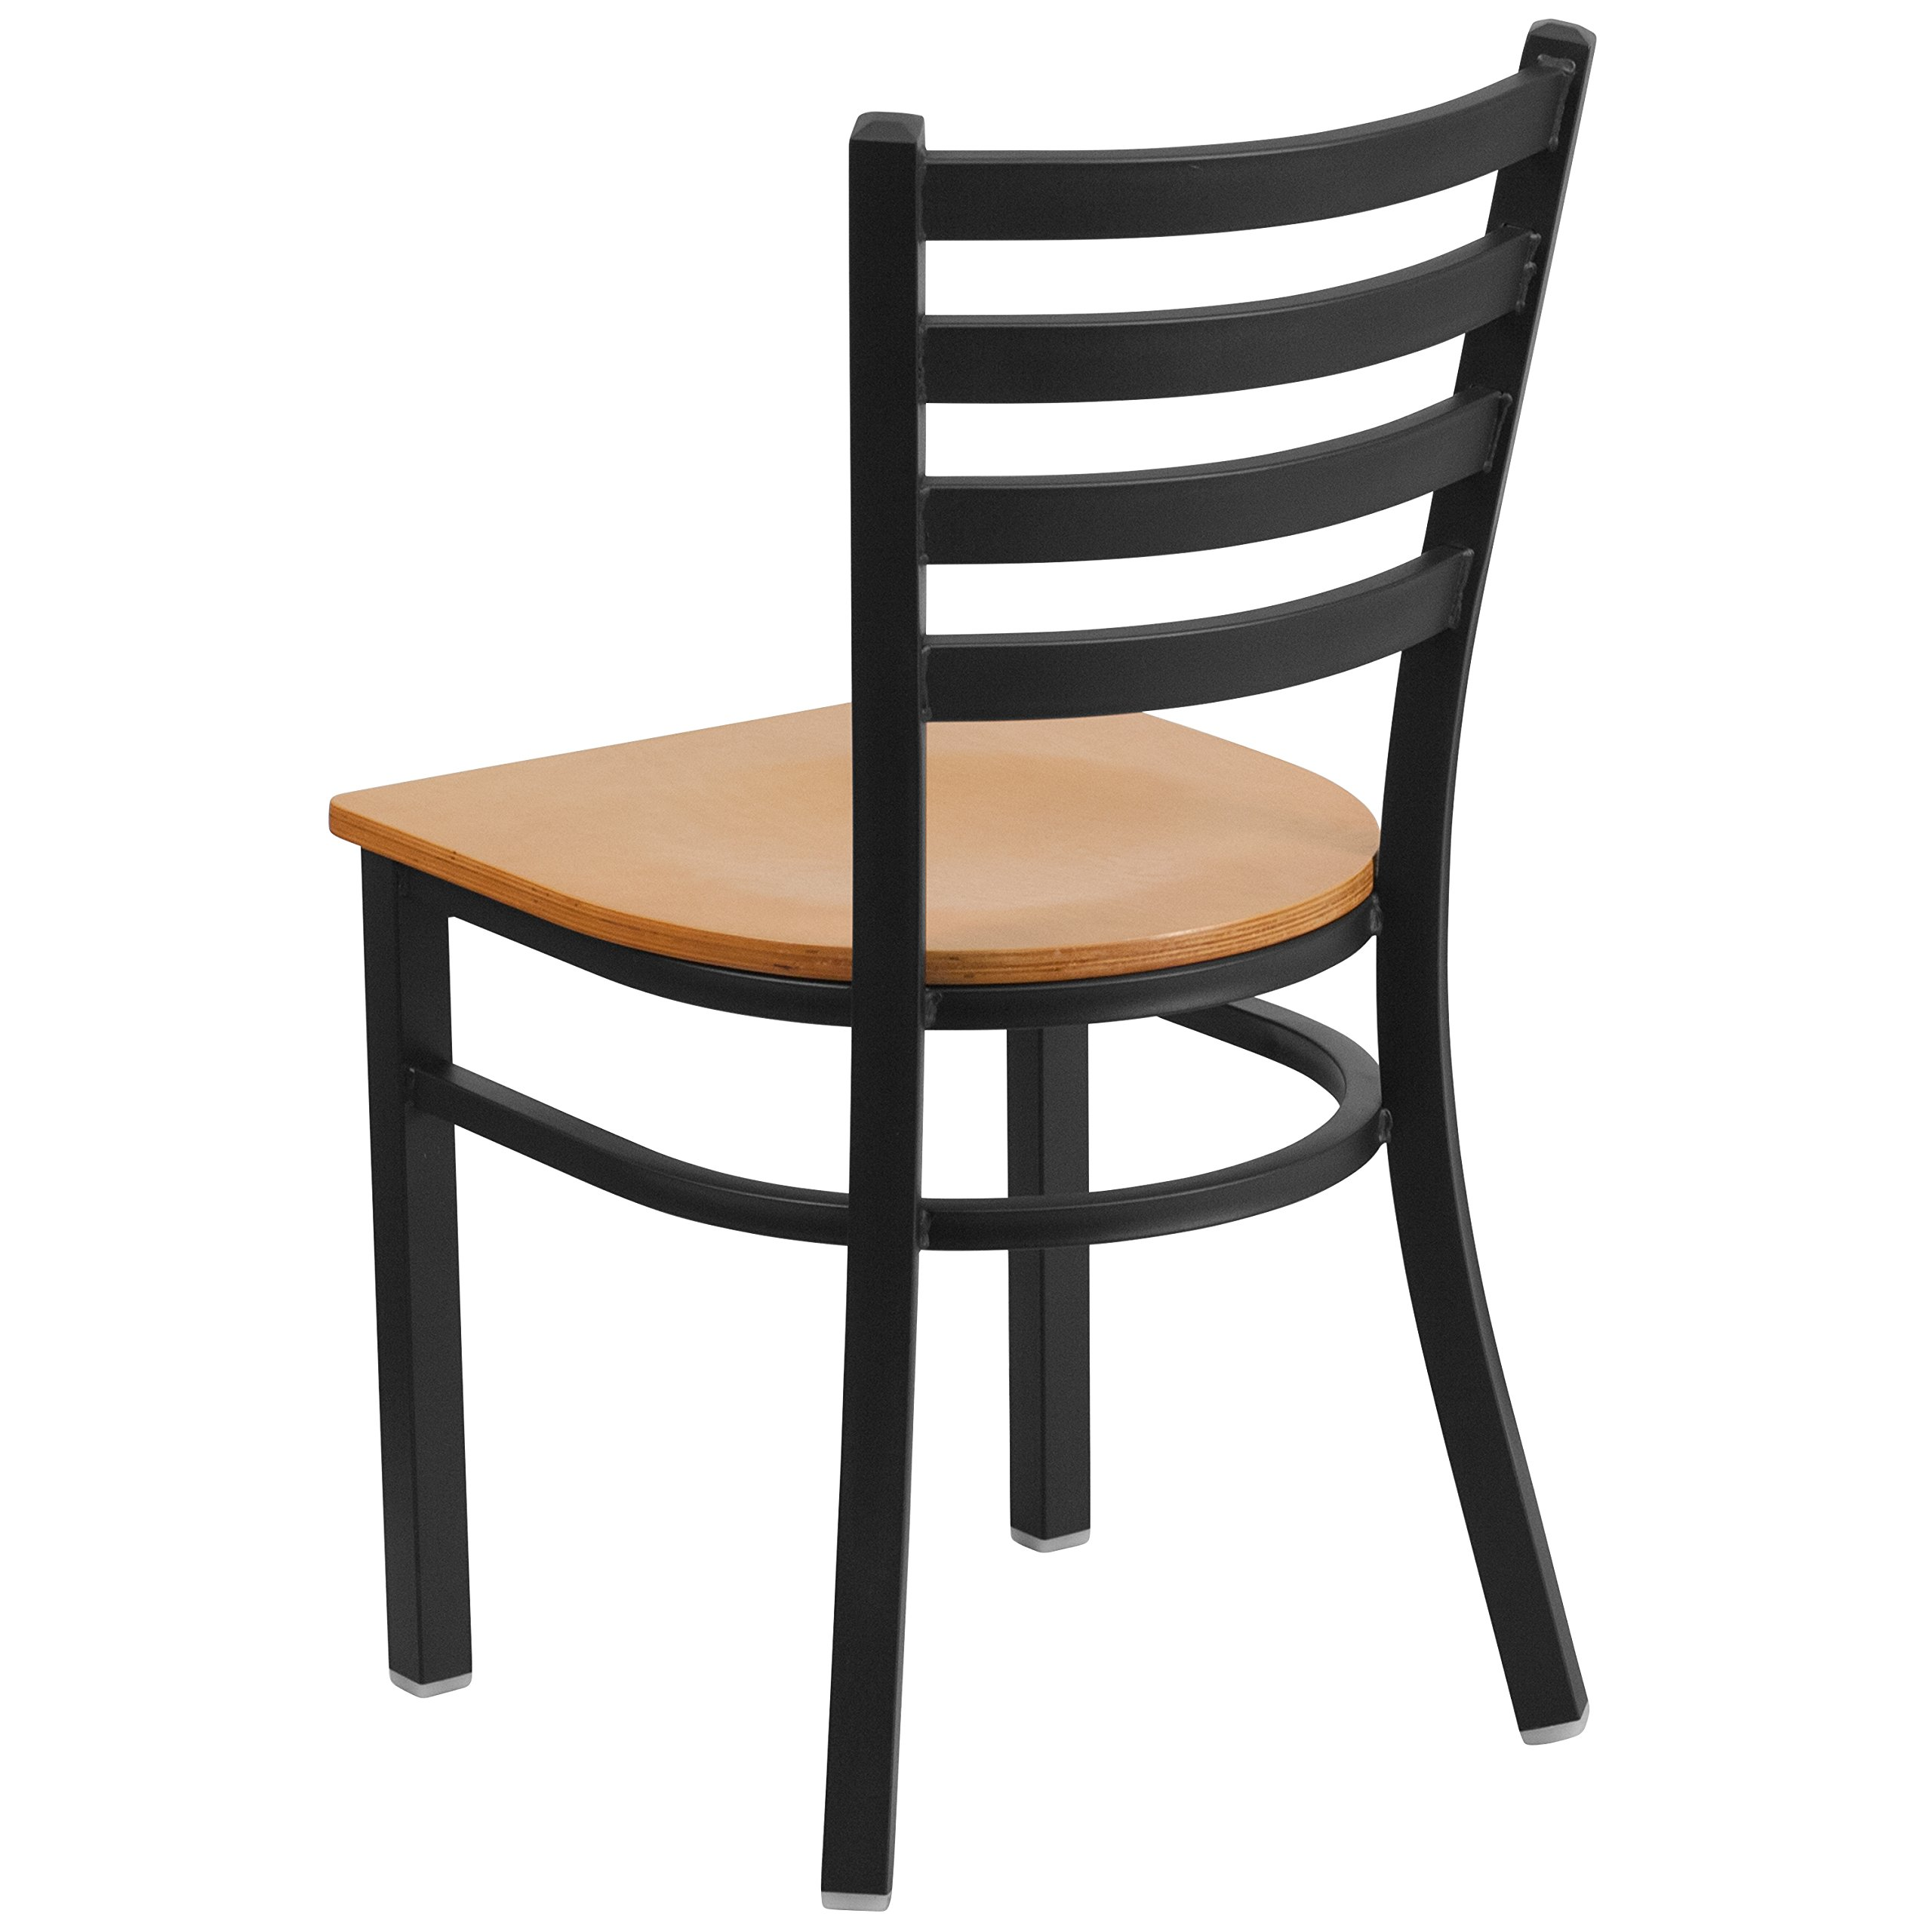 Flash Furniture HERCULES Series Black Ladder Back Metal Restaurant Chair - Natural Wood Seat by Flash Furniture (Image #3)